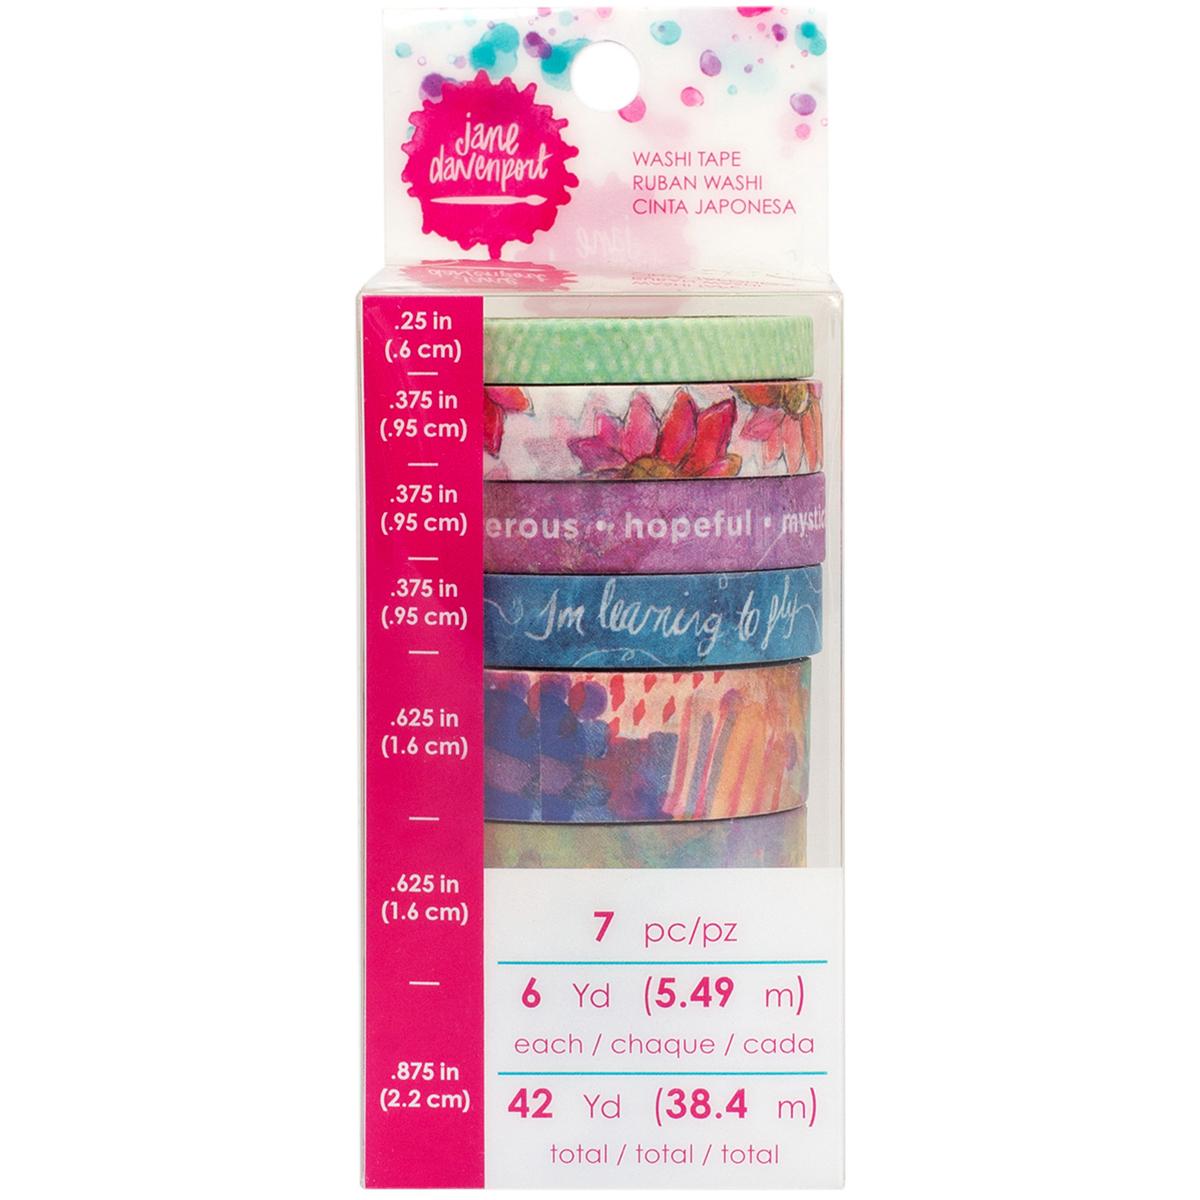 Jane Davenport Mixed Media Washi Tape Rolls 7/Pkg-Fantastical, 6 Yards Each